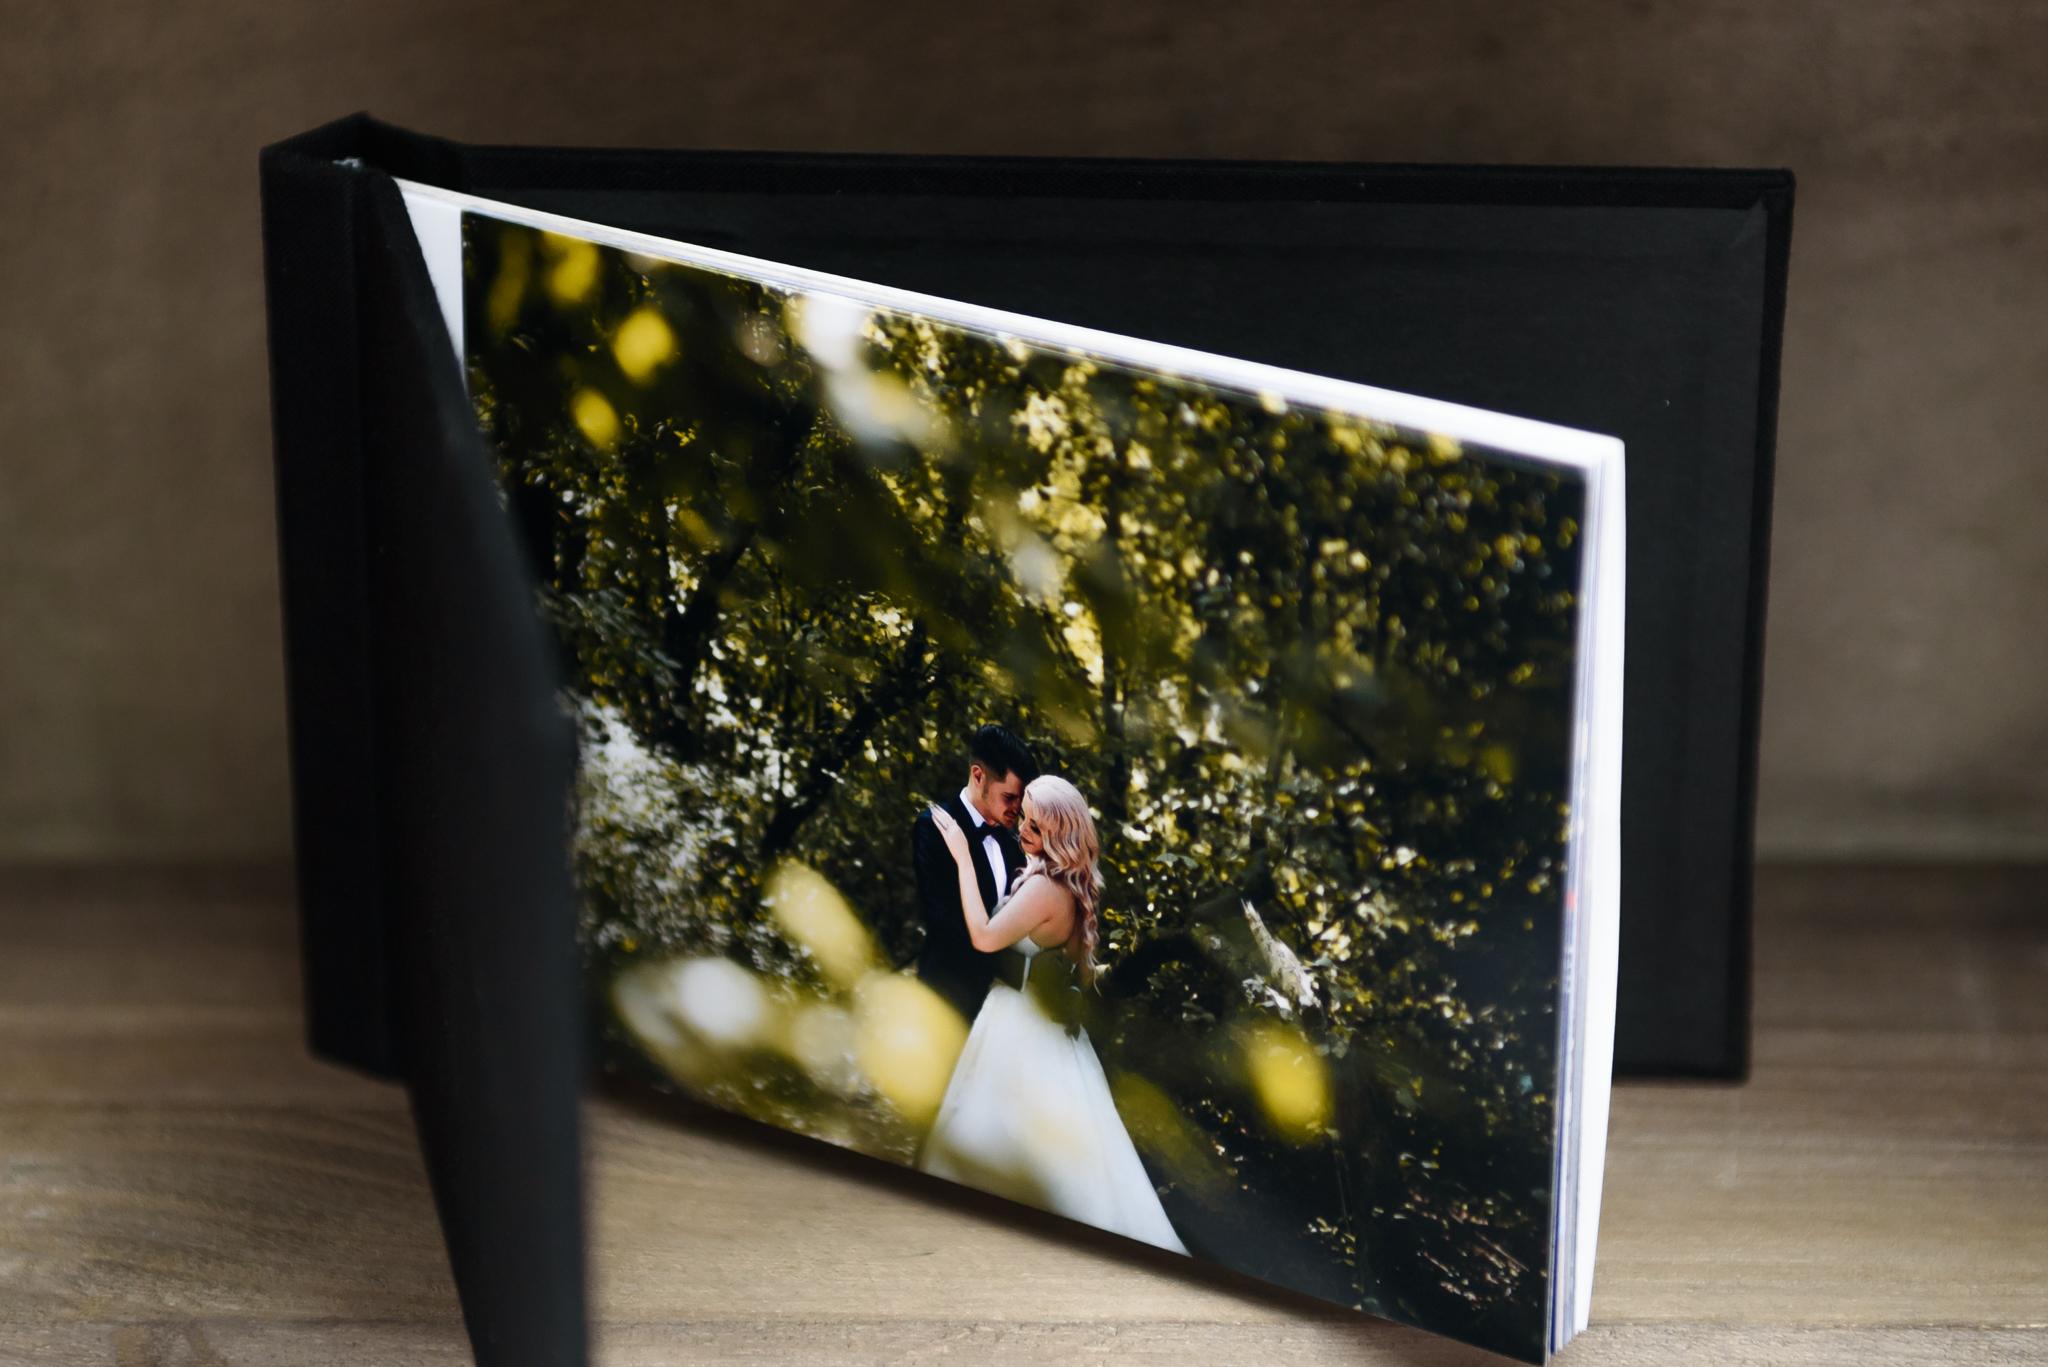 Albume pinchbook, textil - Dimensiune disponibilă: 10x15cm (30 lei/buc), 13x18 cm (45 lei/buc).Stoc:10x15cm: Negru - 9 buc, Rosu - 3 buc;13x18cm: Negru - 5 buc, Rosu - 2 buc.